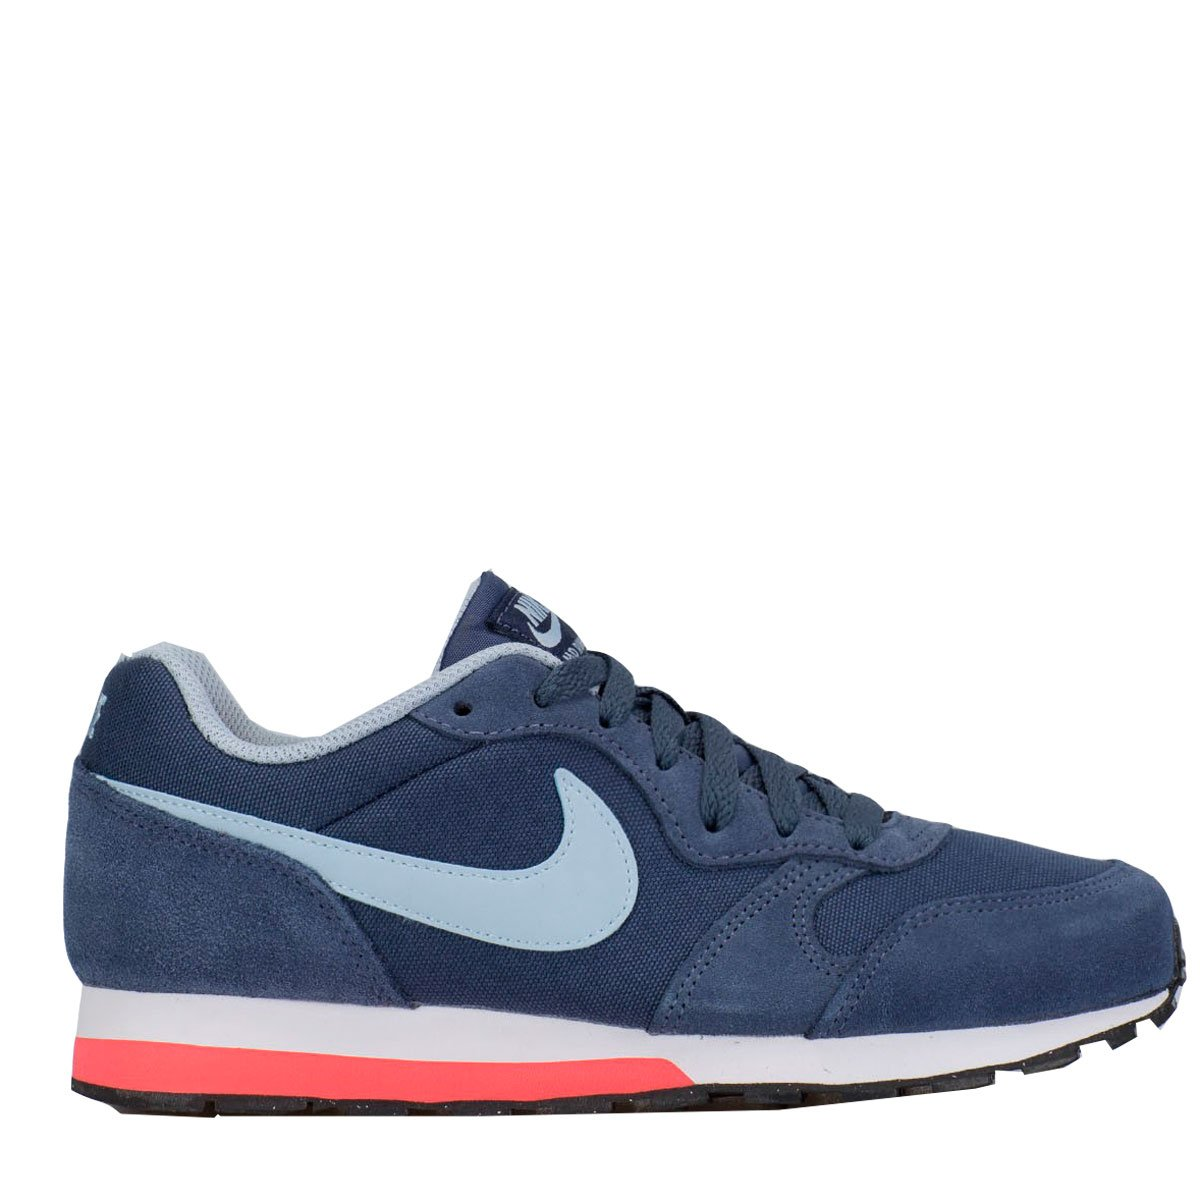 Bizz Store - Tênis Feminino Nike MD Runner 2 GS Corrida f06f22e96c599